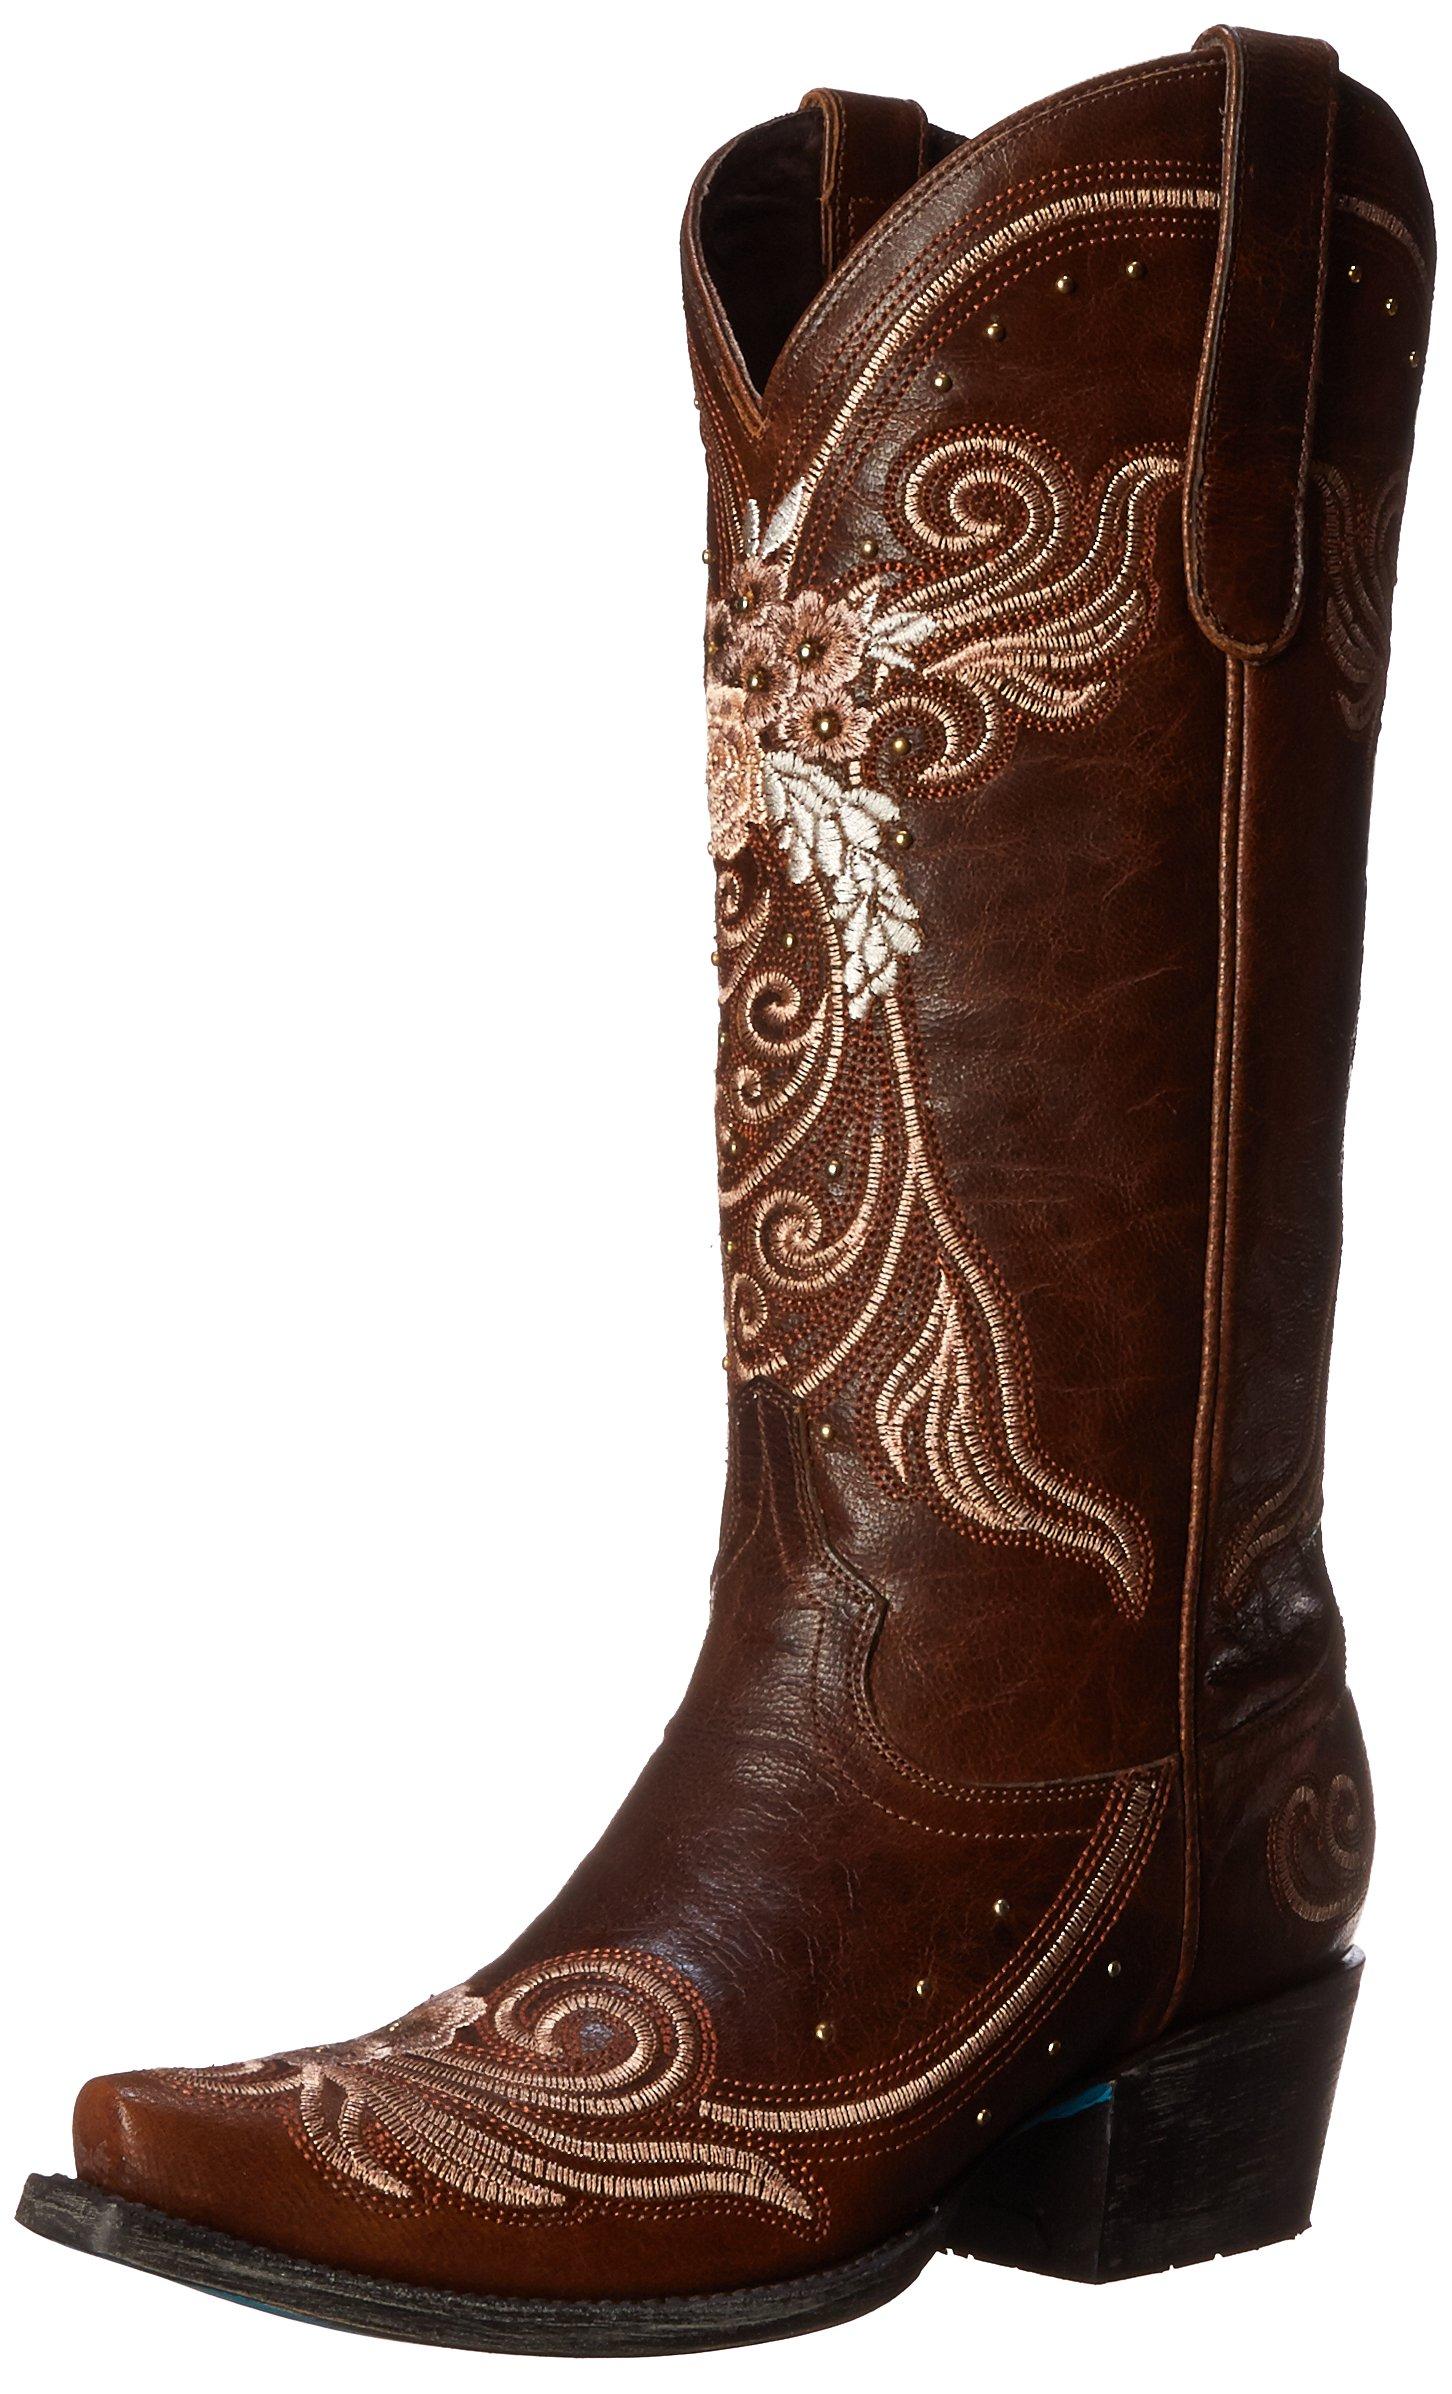 Lane Boots Women's Wedding Western Boot, Brown, 9 M US